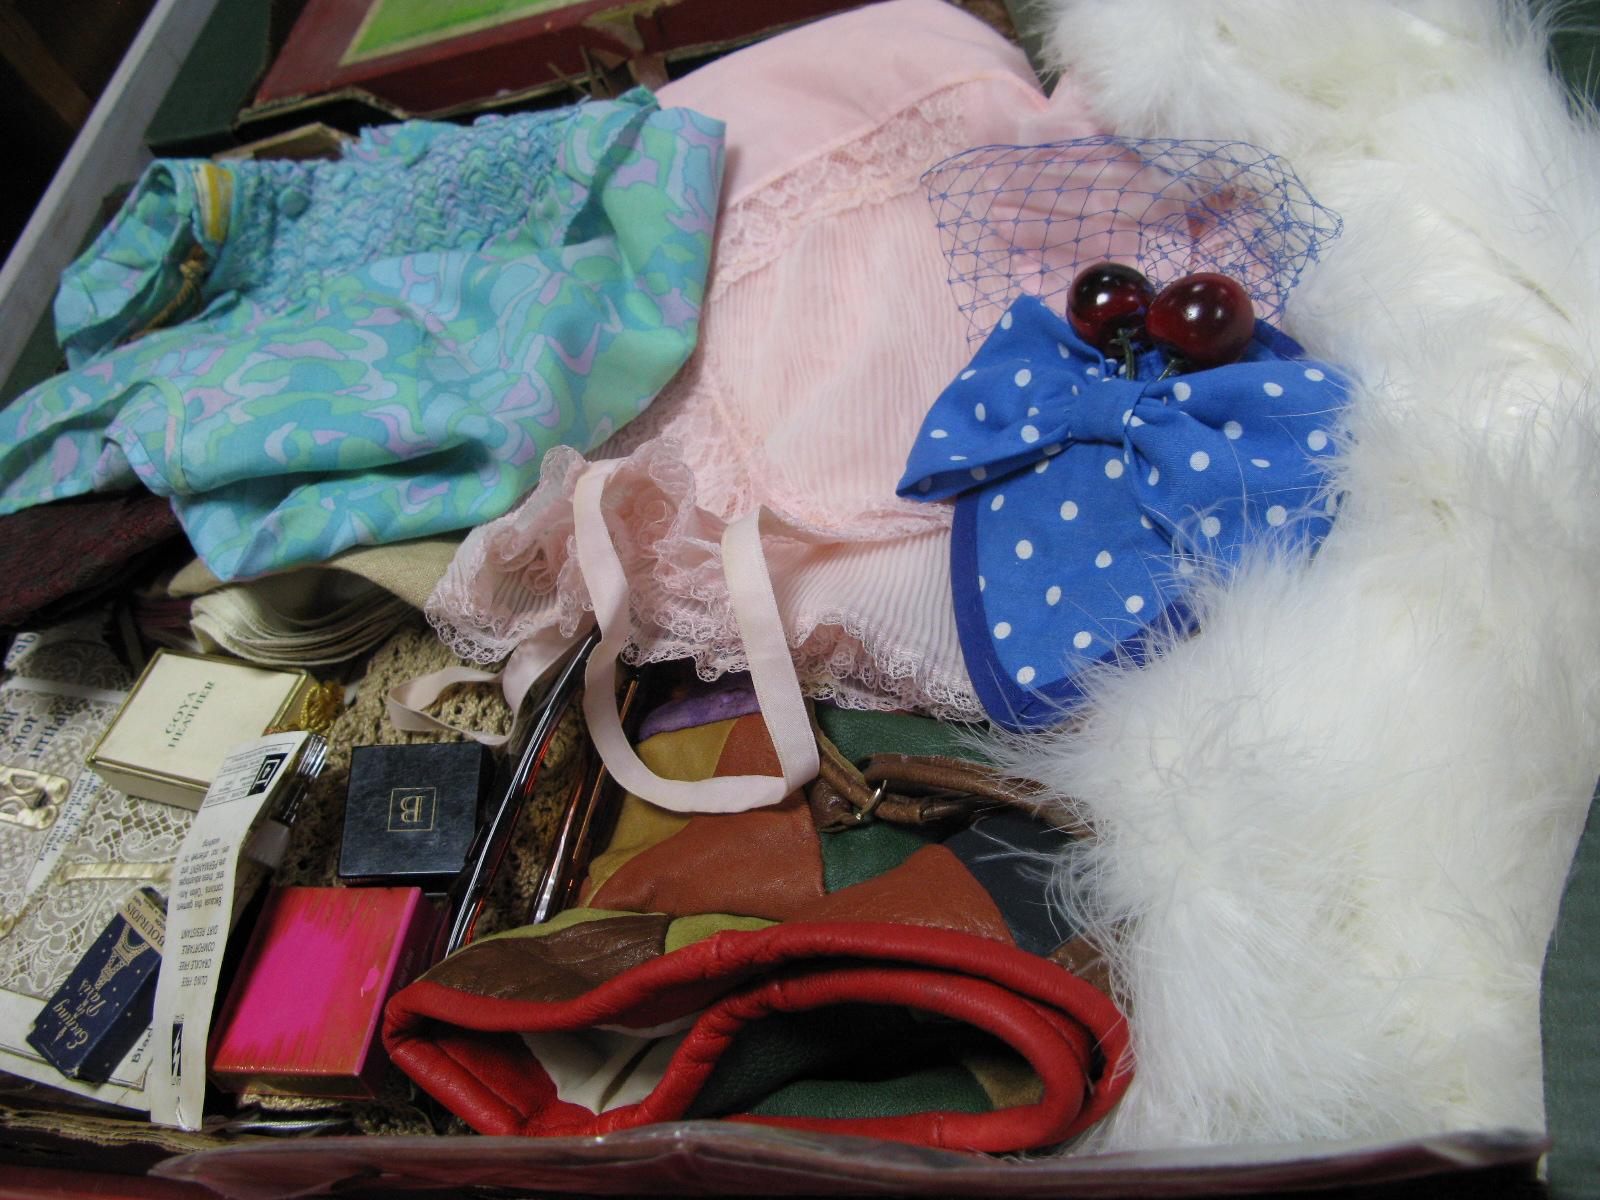 Lot 1055 - c.1950''s Vintage Blouses and Slips, marabou bolero, stockings, linen, 'Made by Me' fascinator,